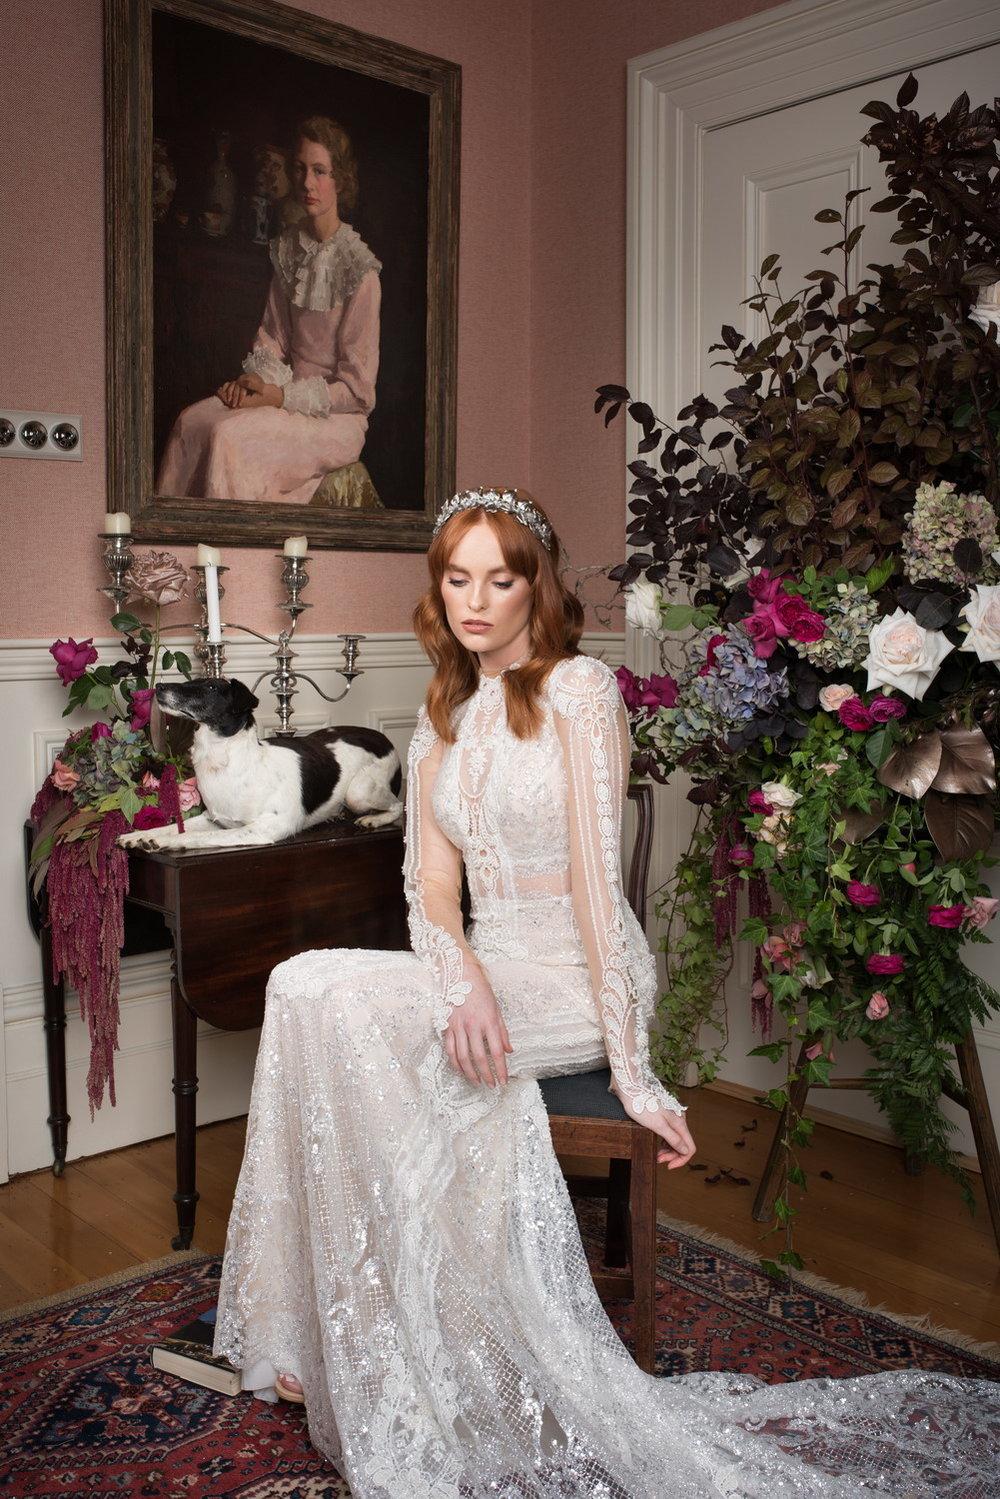 Viktoria-Novak-Immortal-Renaissance-2018-shoot-Hopewood-House5-KarenWoo21.jpg